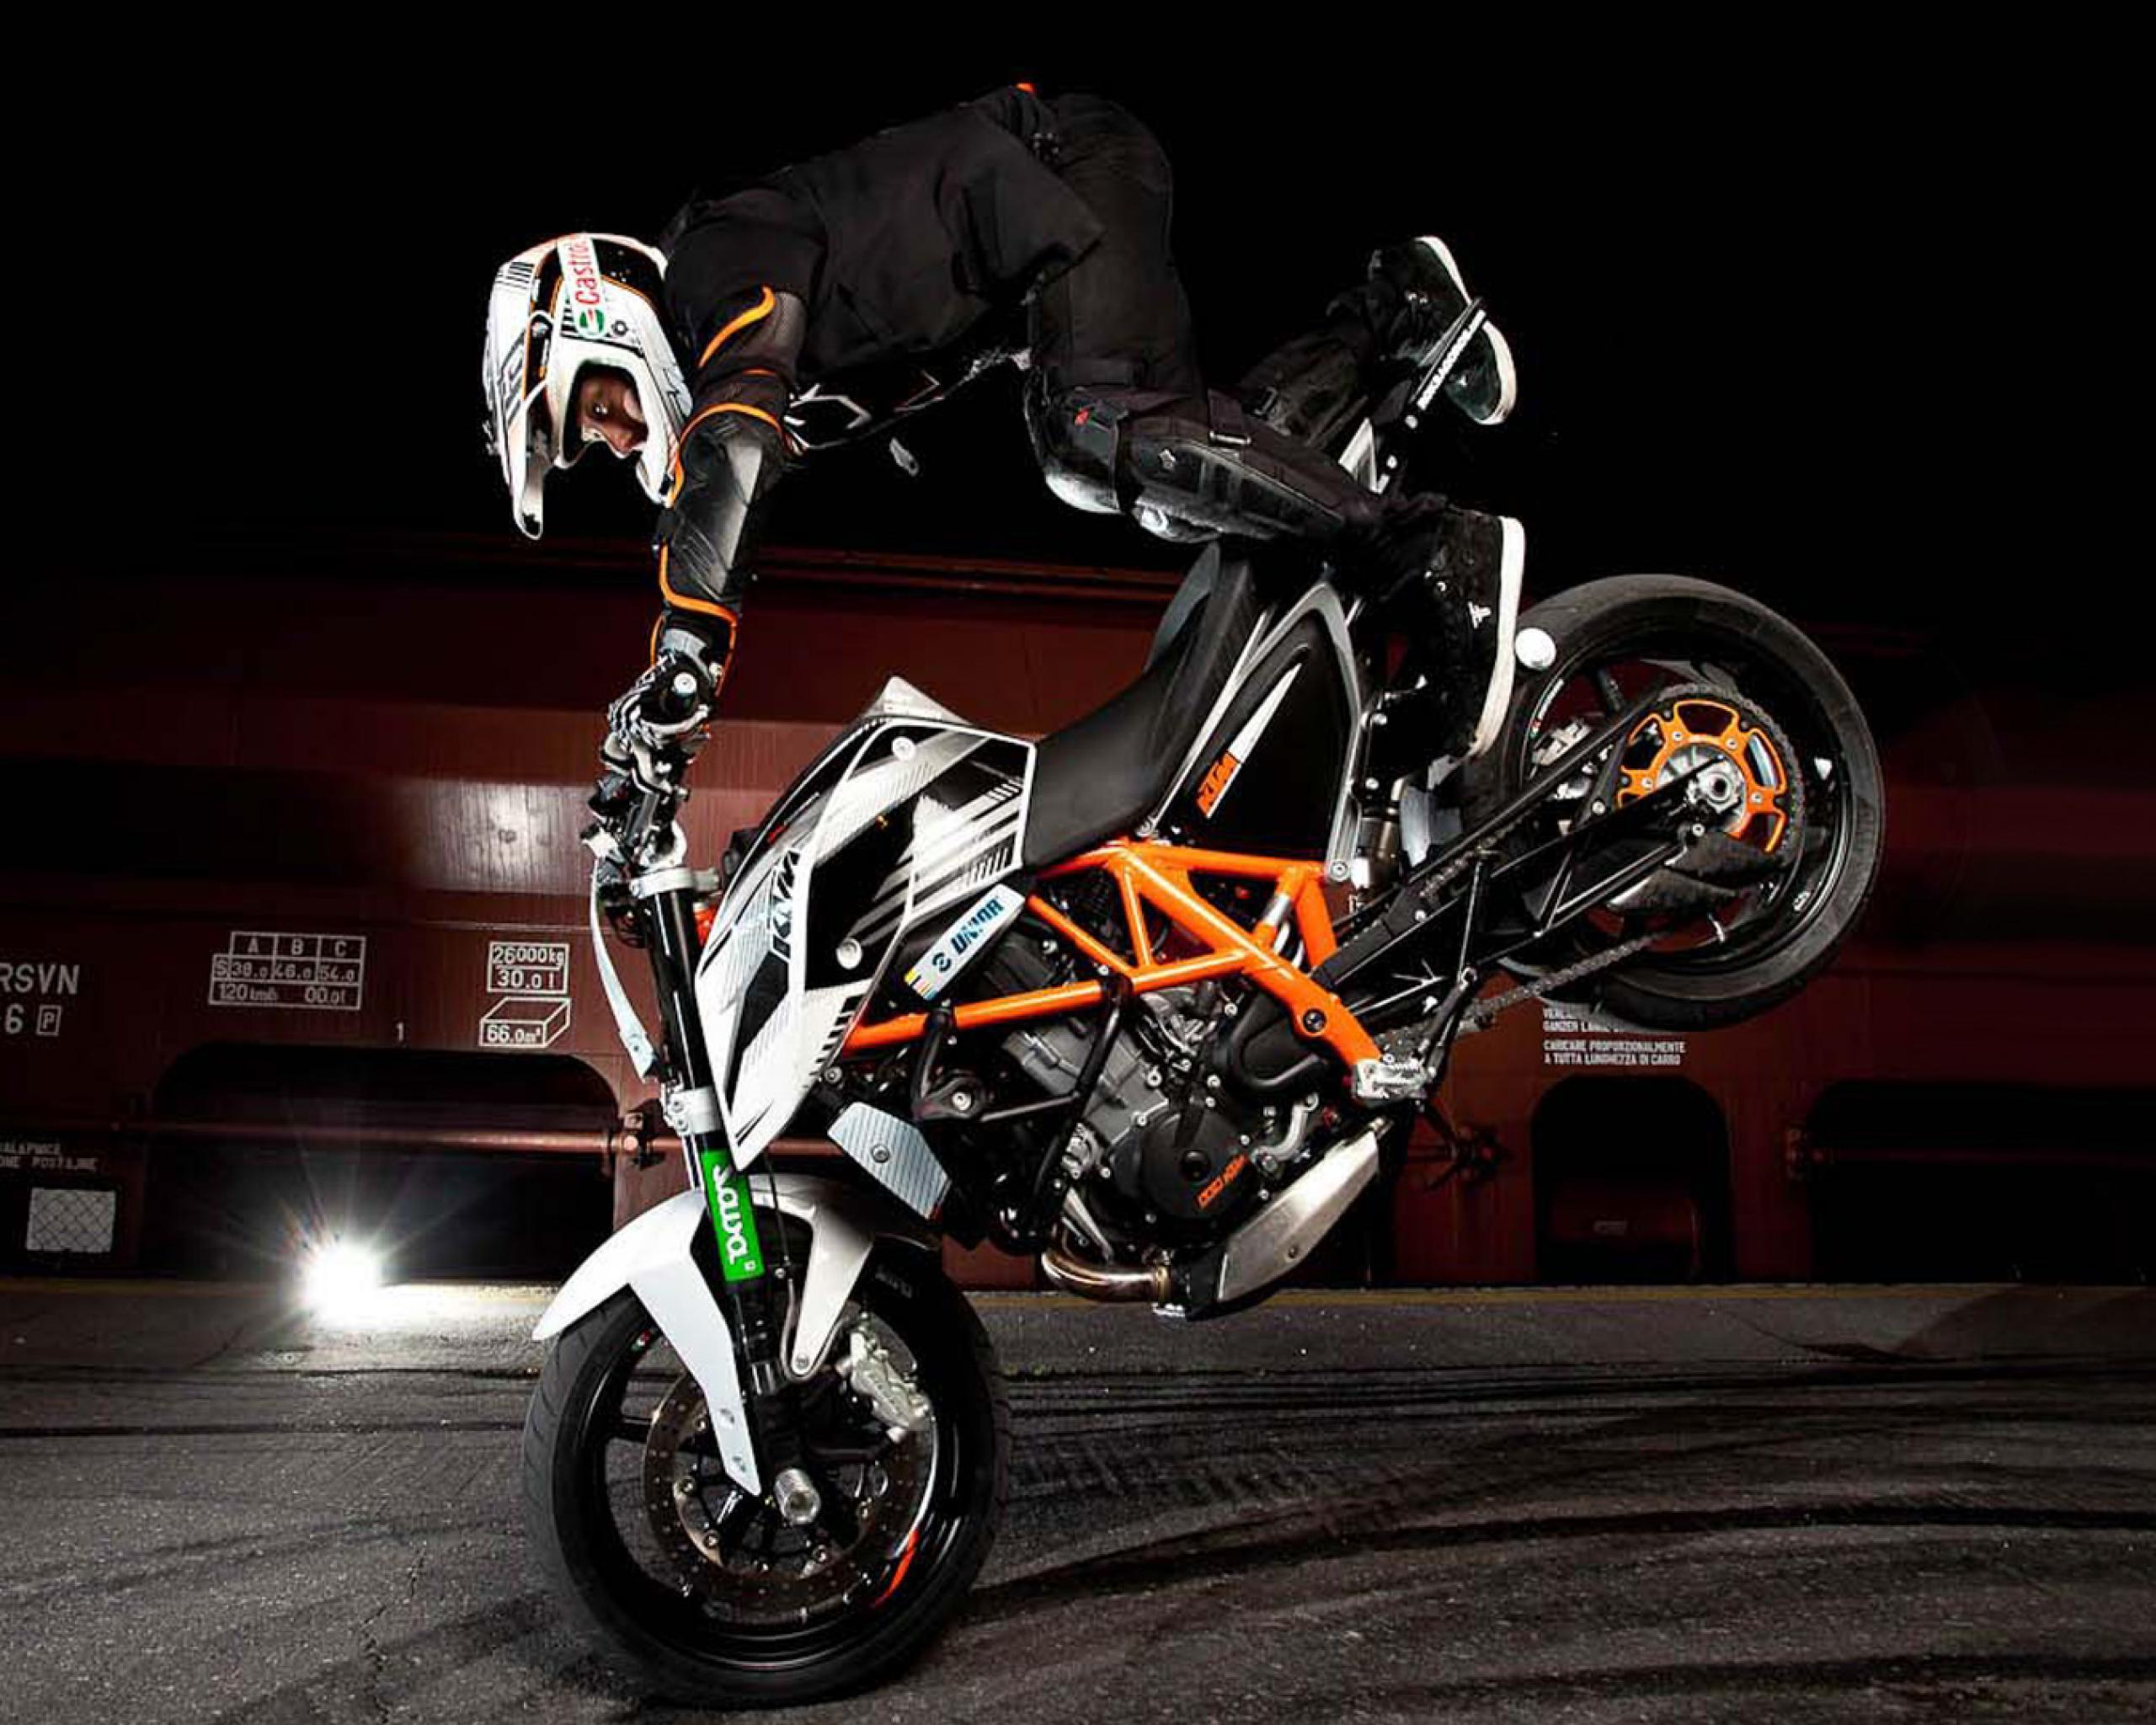 Bike Stunt Hd Wallpaper For Mobile Ktm Bike Wallpapers Wallpaper Cave